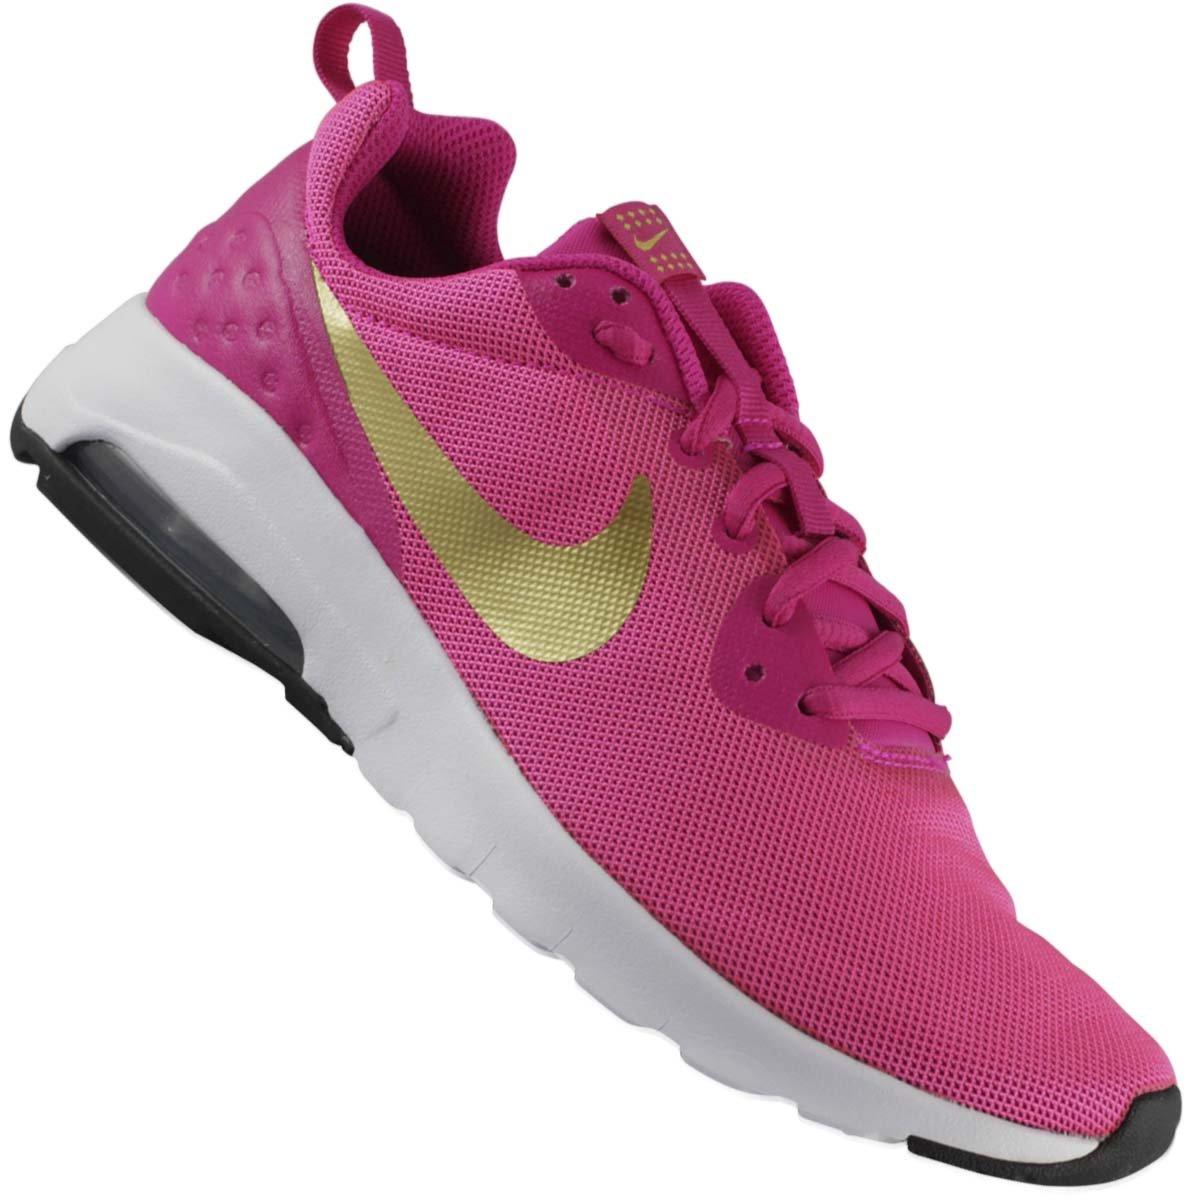 1d777bff2 Tênis Nike Air Max Motion Juvenil Feminino | Treino e Corrida